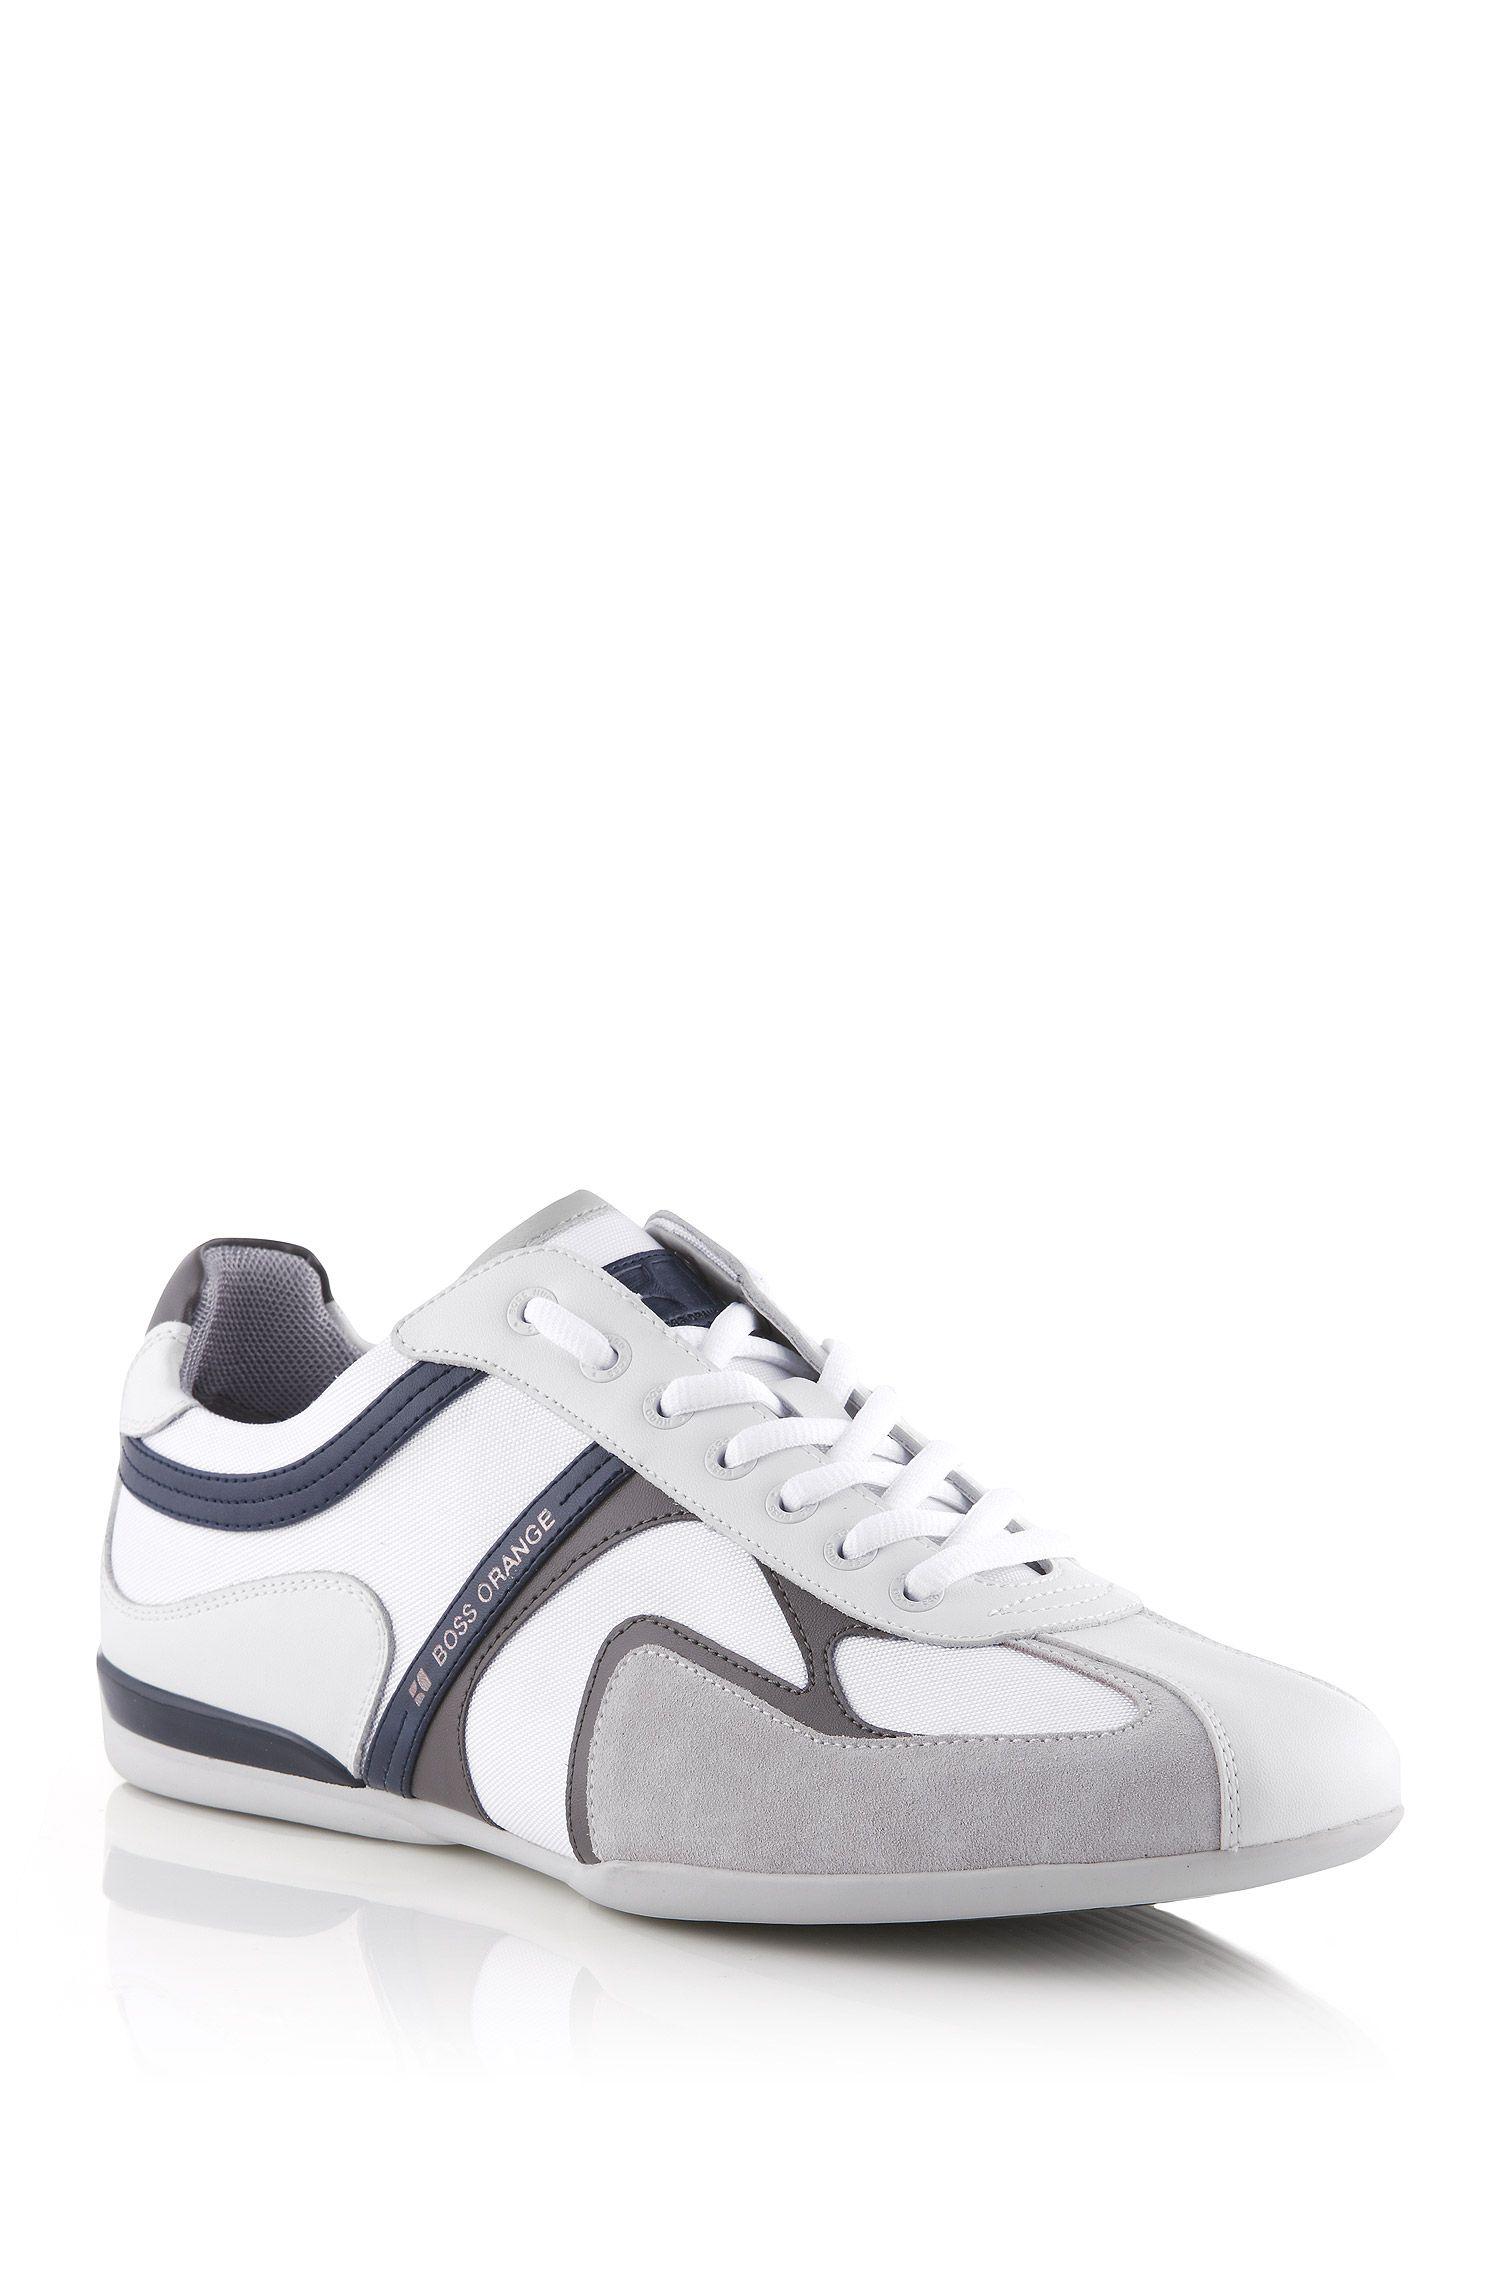 Sneaker ´Seamon` aus Kunstfaser-Mix mit Leder